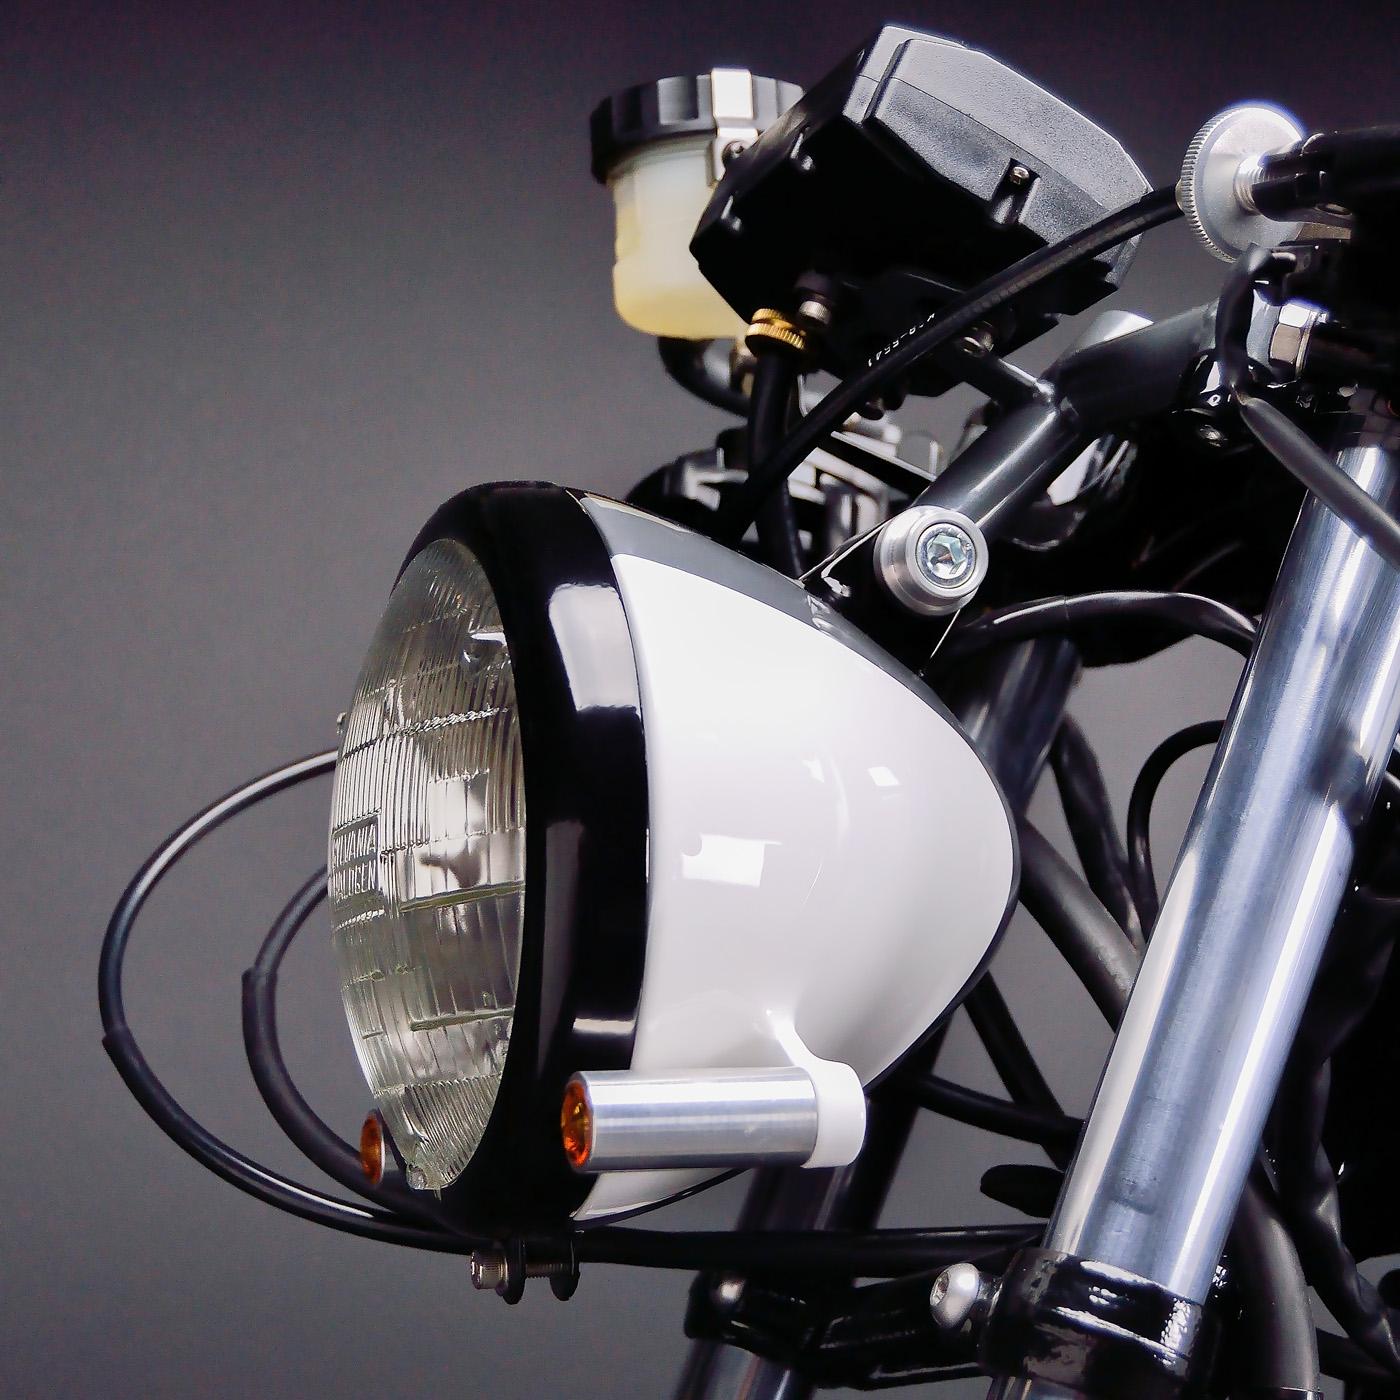 Honda Cx500 For Sale >> Custom Honda CX500 Cafe Racer / Motorcycle Build | Vintage Bike CX 500